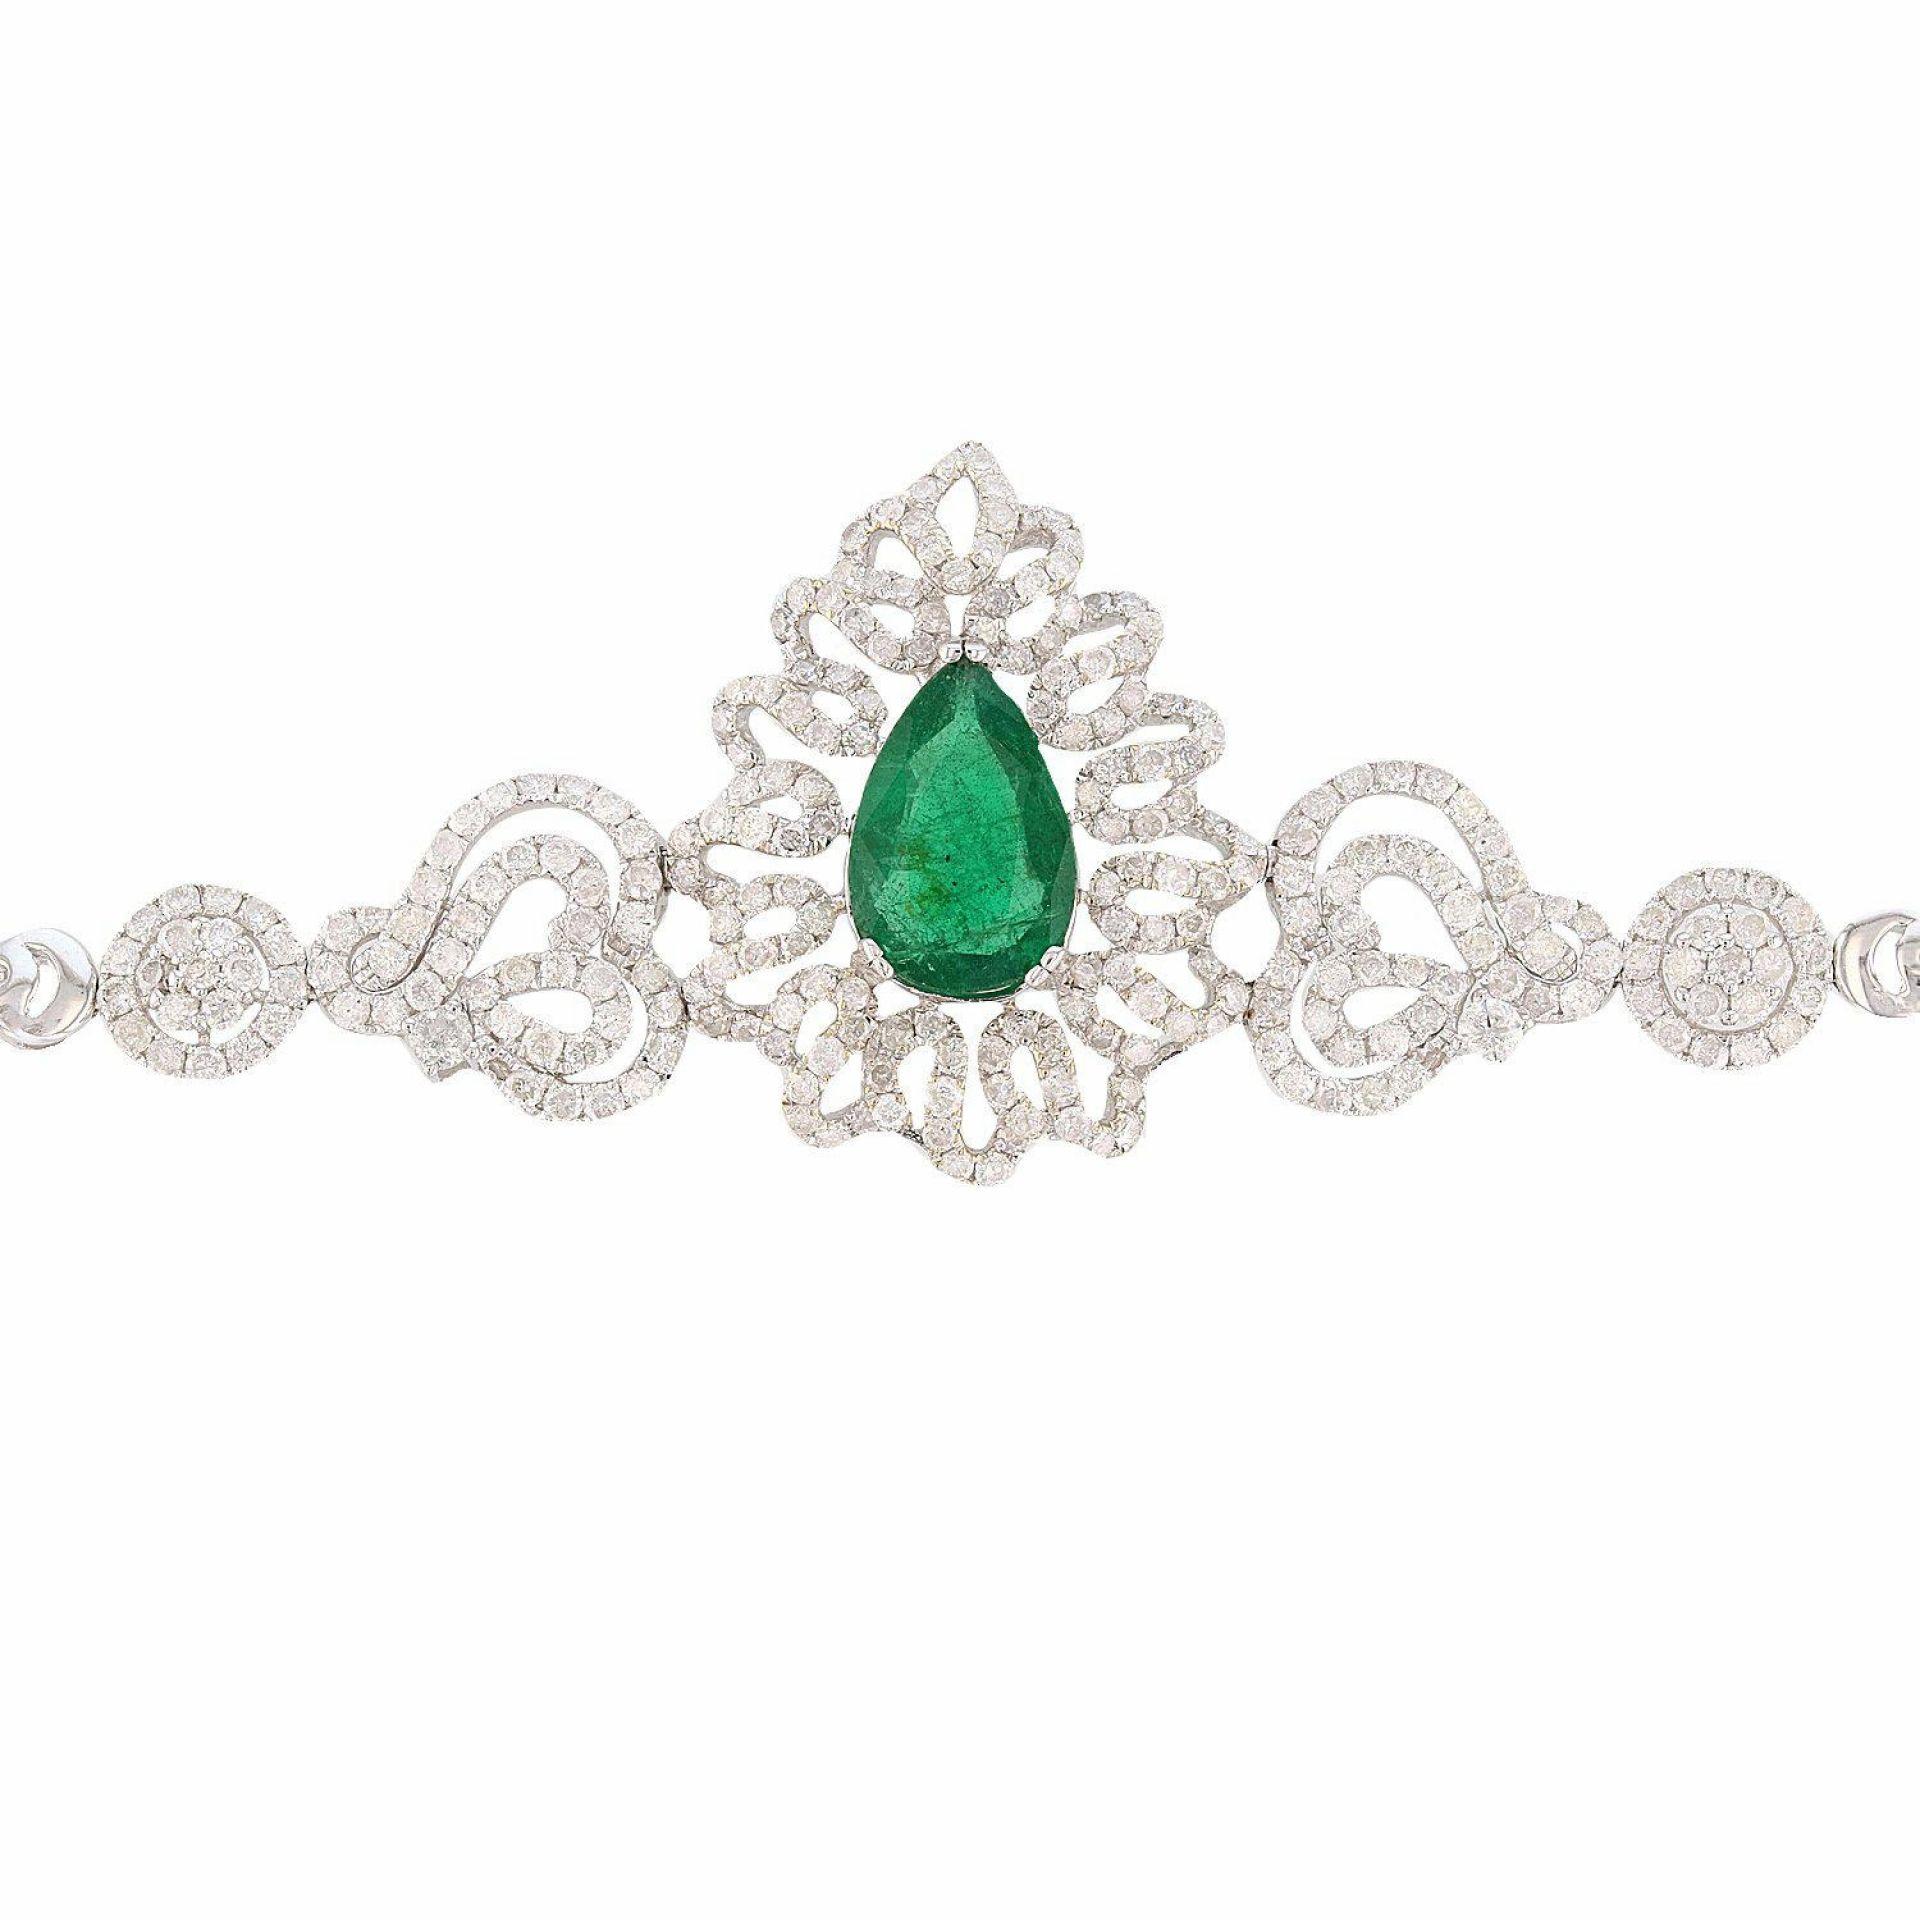 2.75ct Emerald and 3.19ctw Diamond 14K White Gold Bracelet